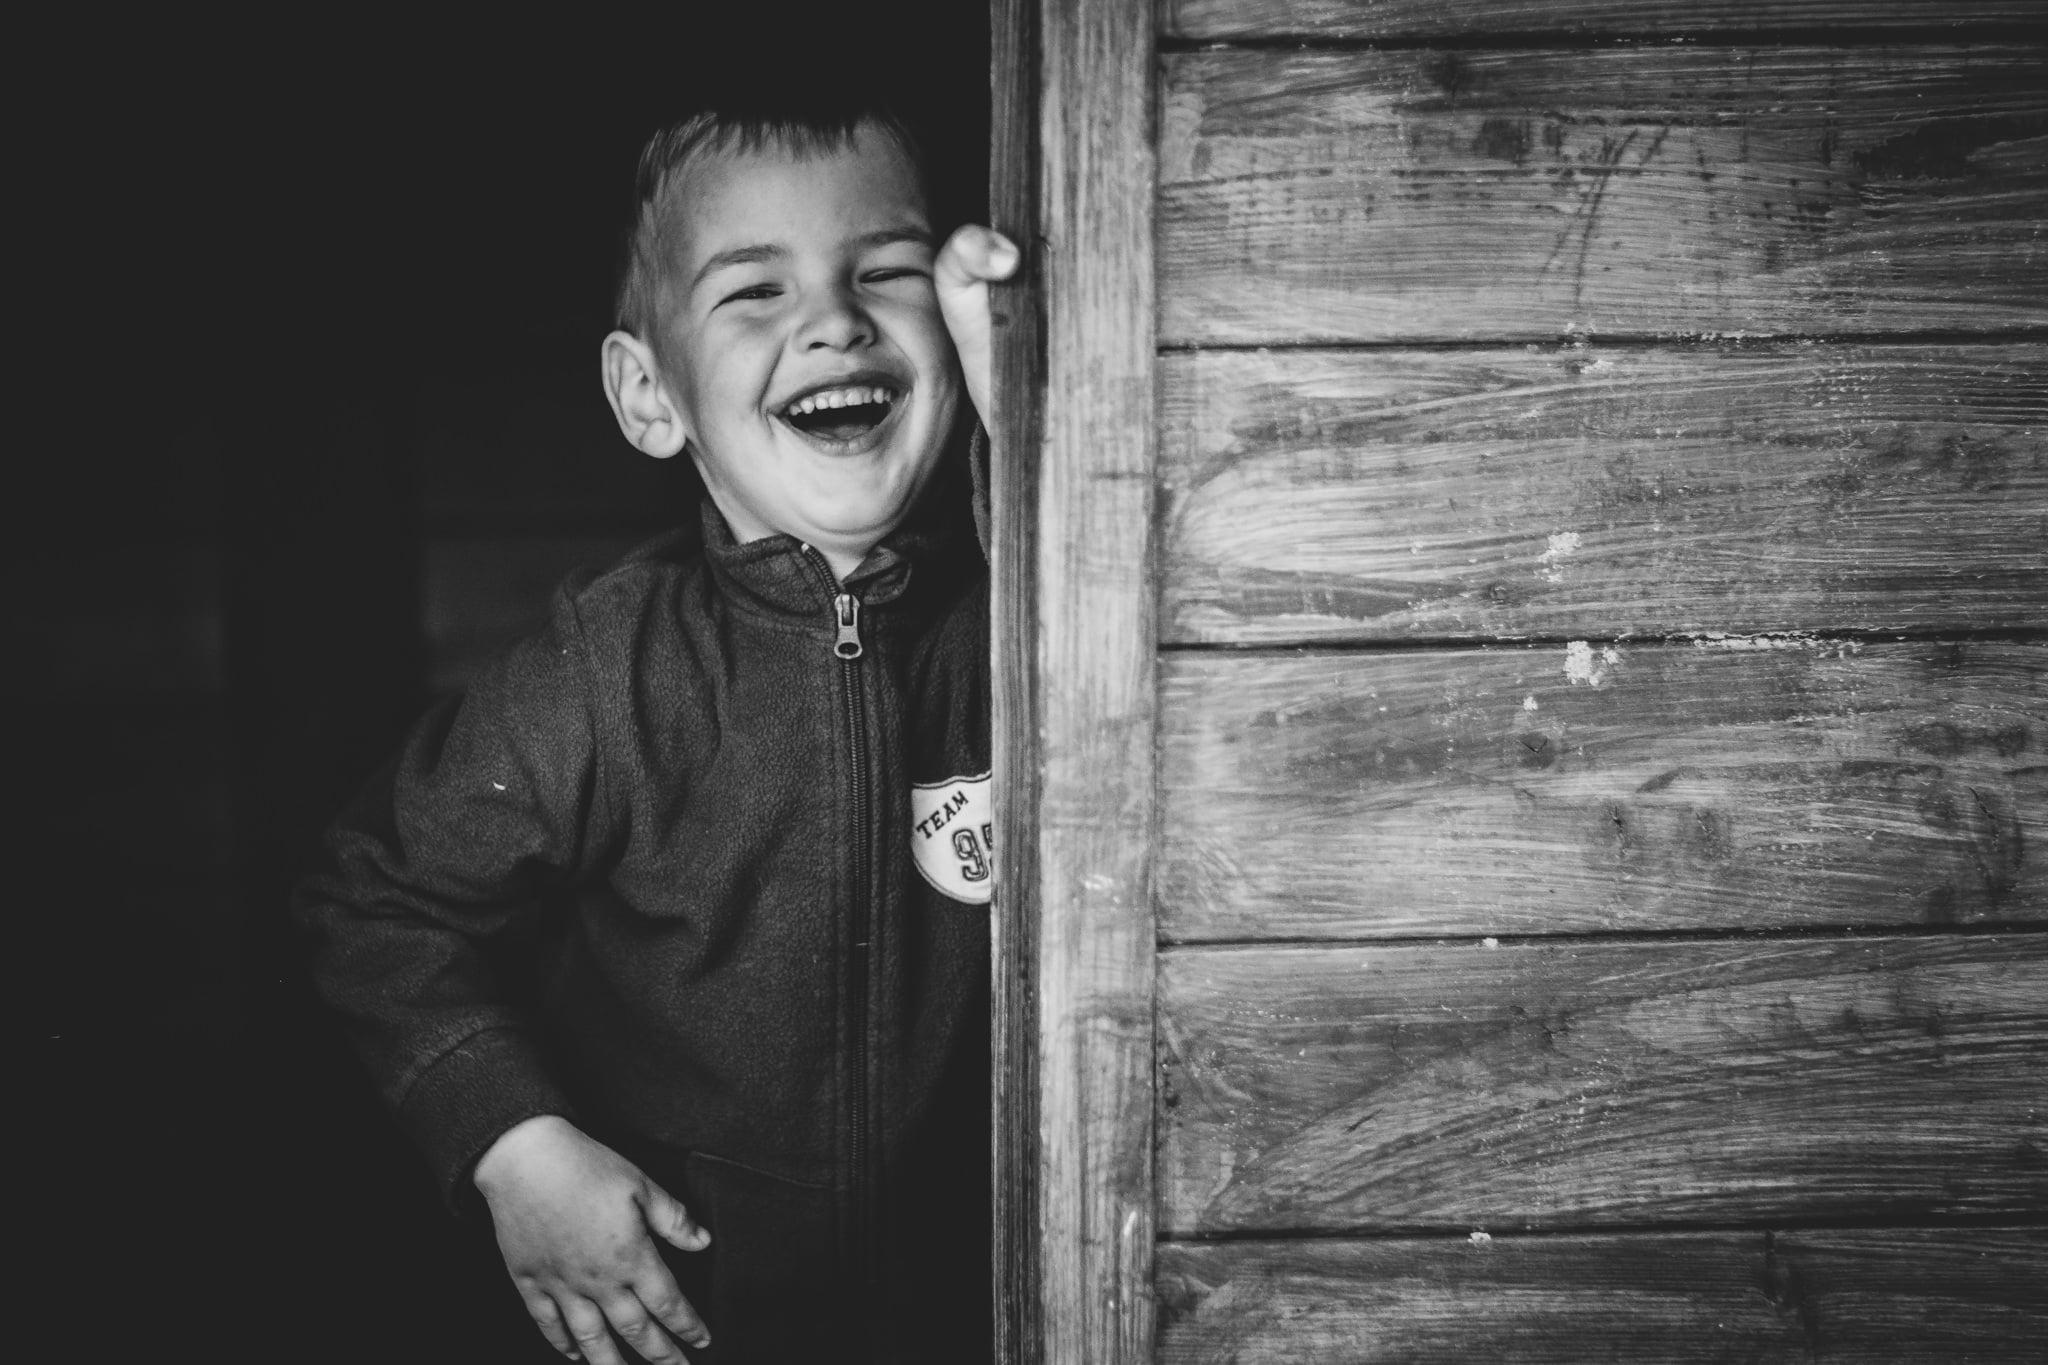 Kindergartenbilder kamera kunterbunt authentische